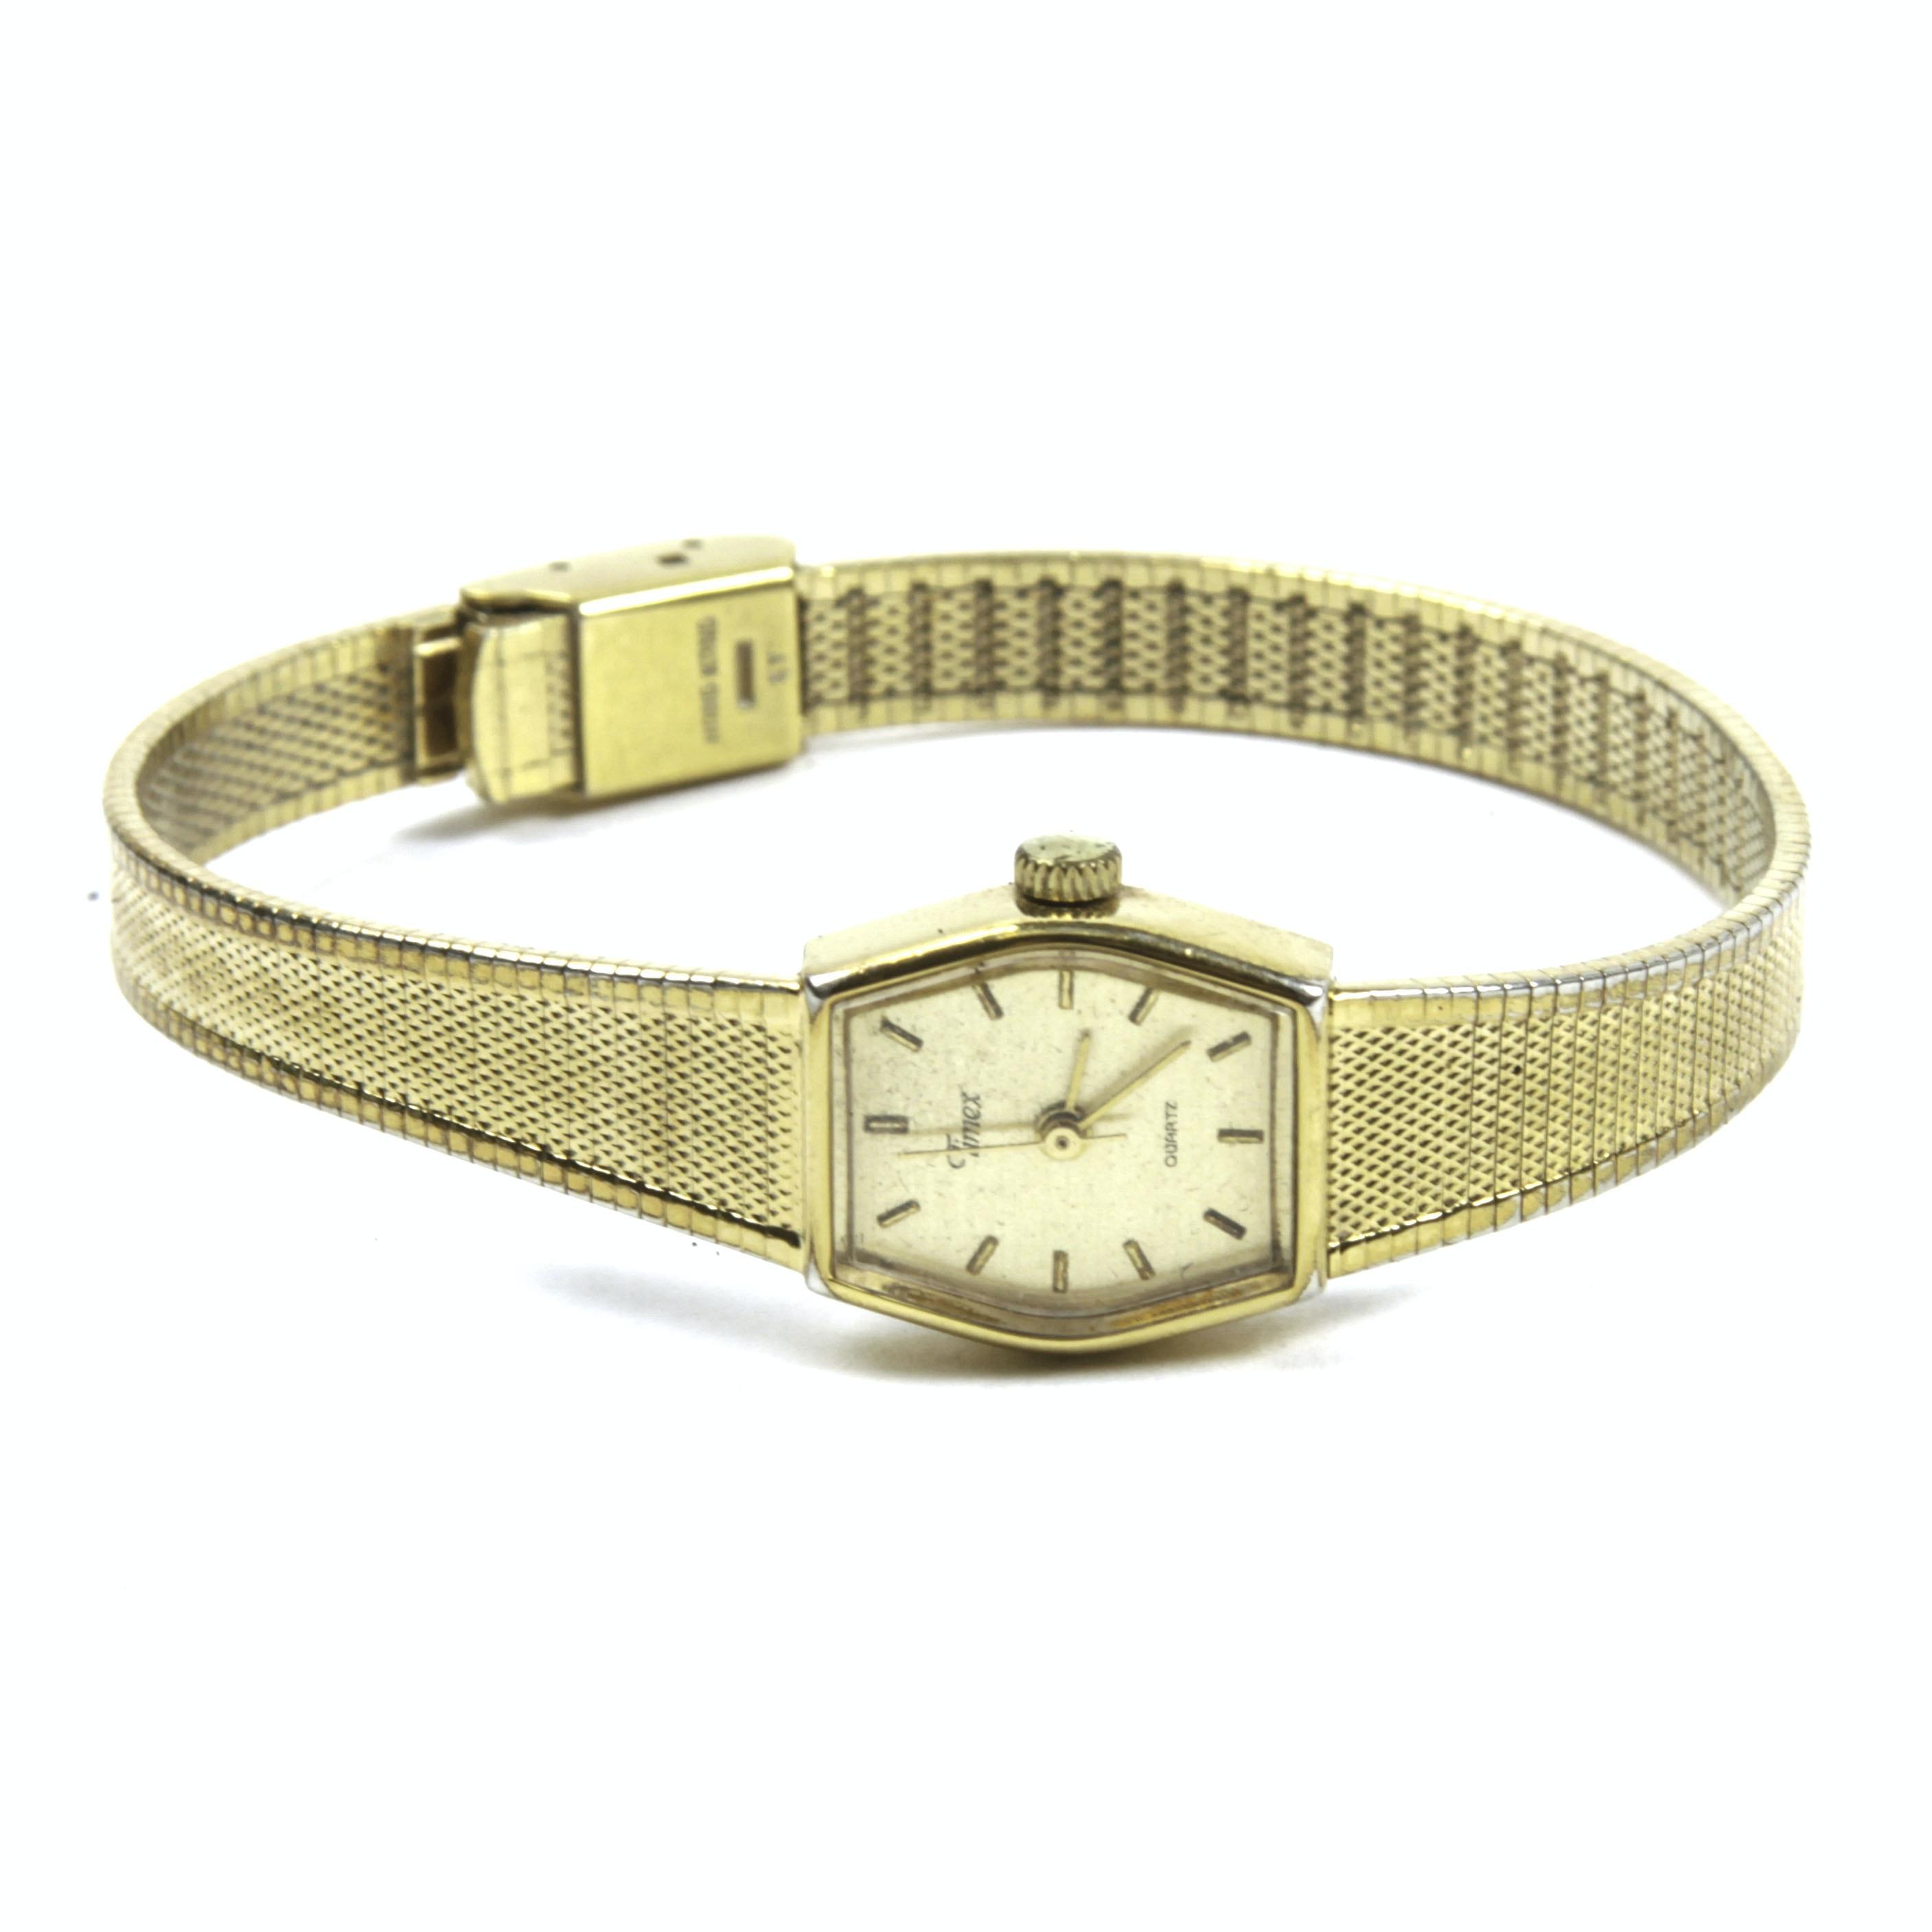 Vintage Gold Tone Timex Wristwatch